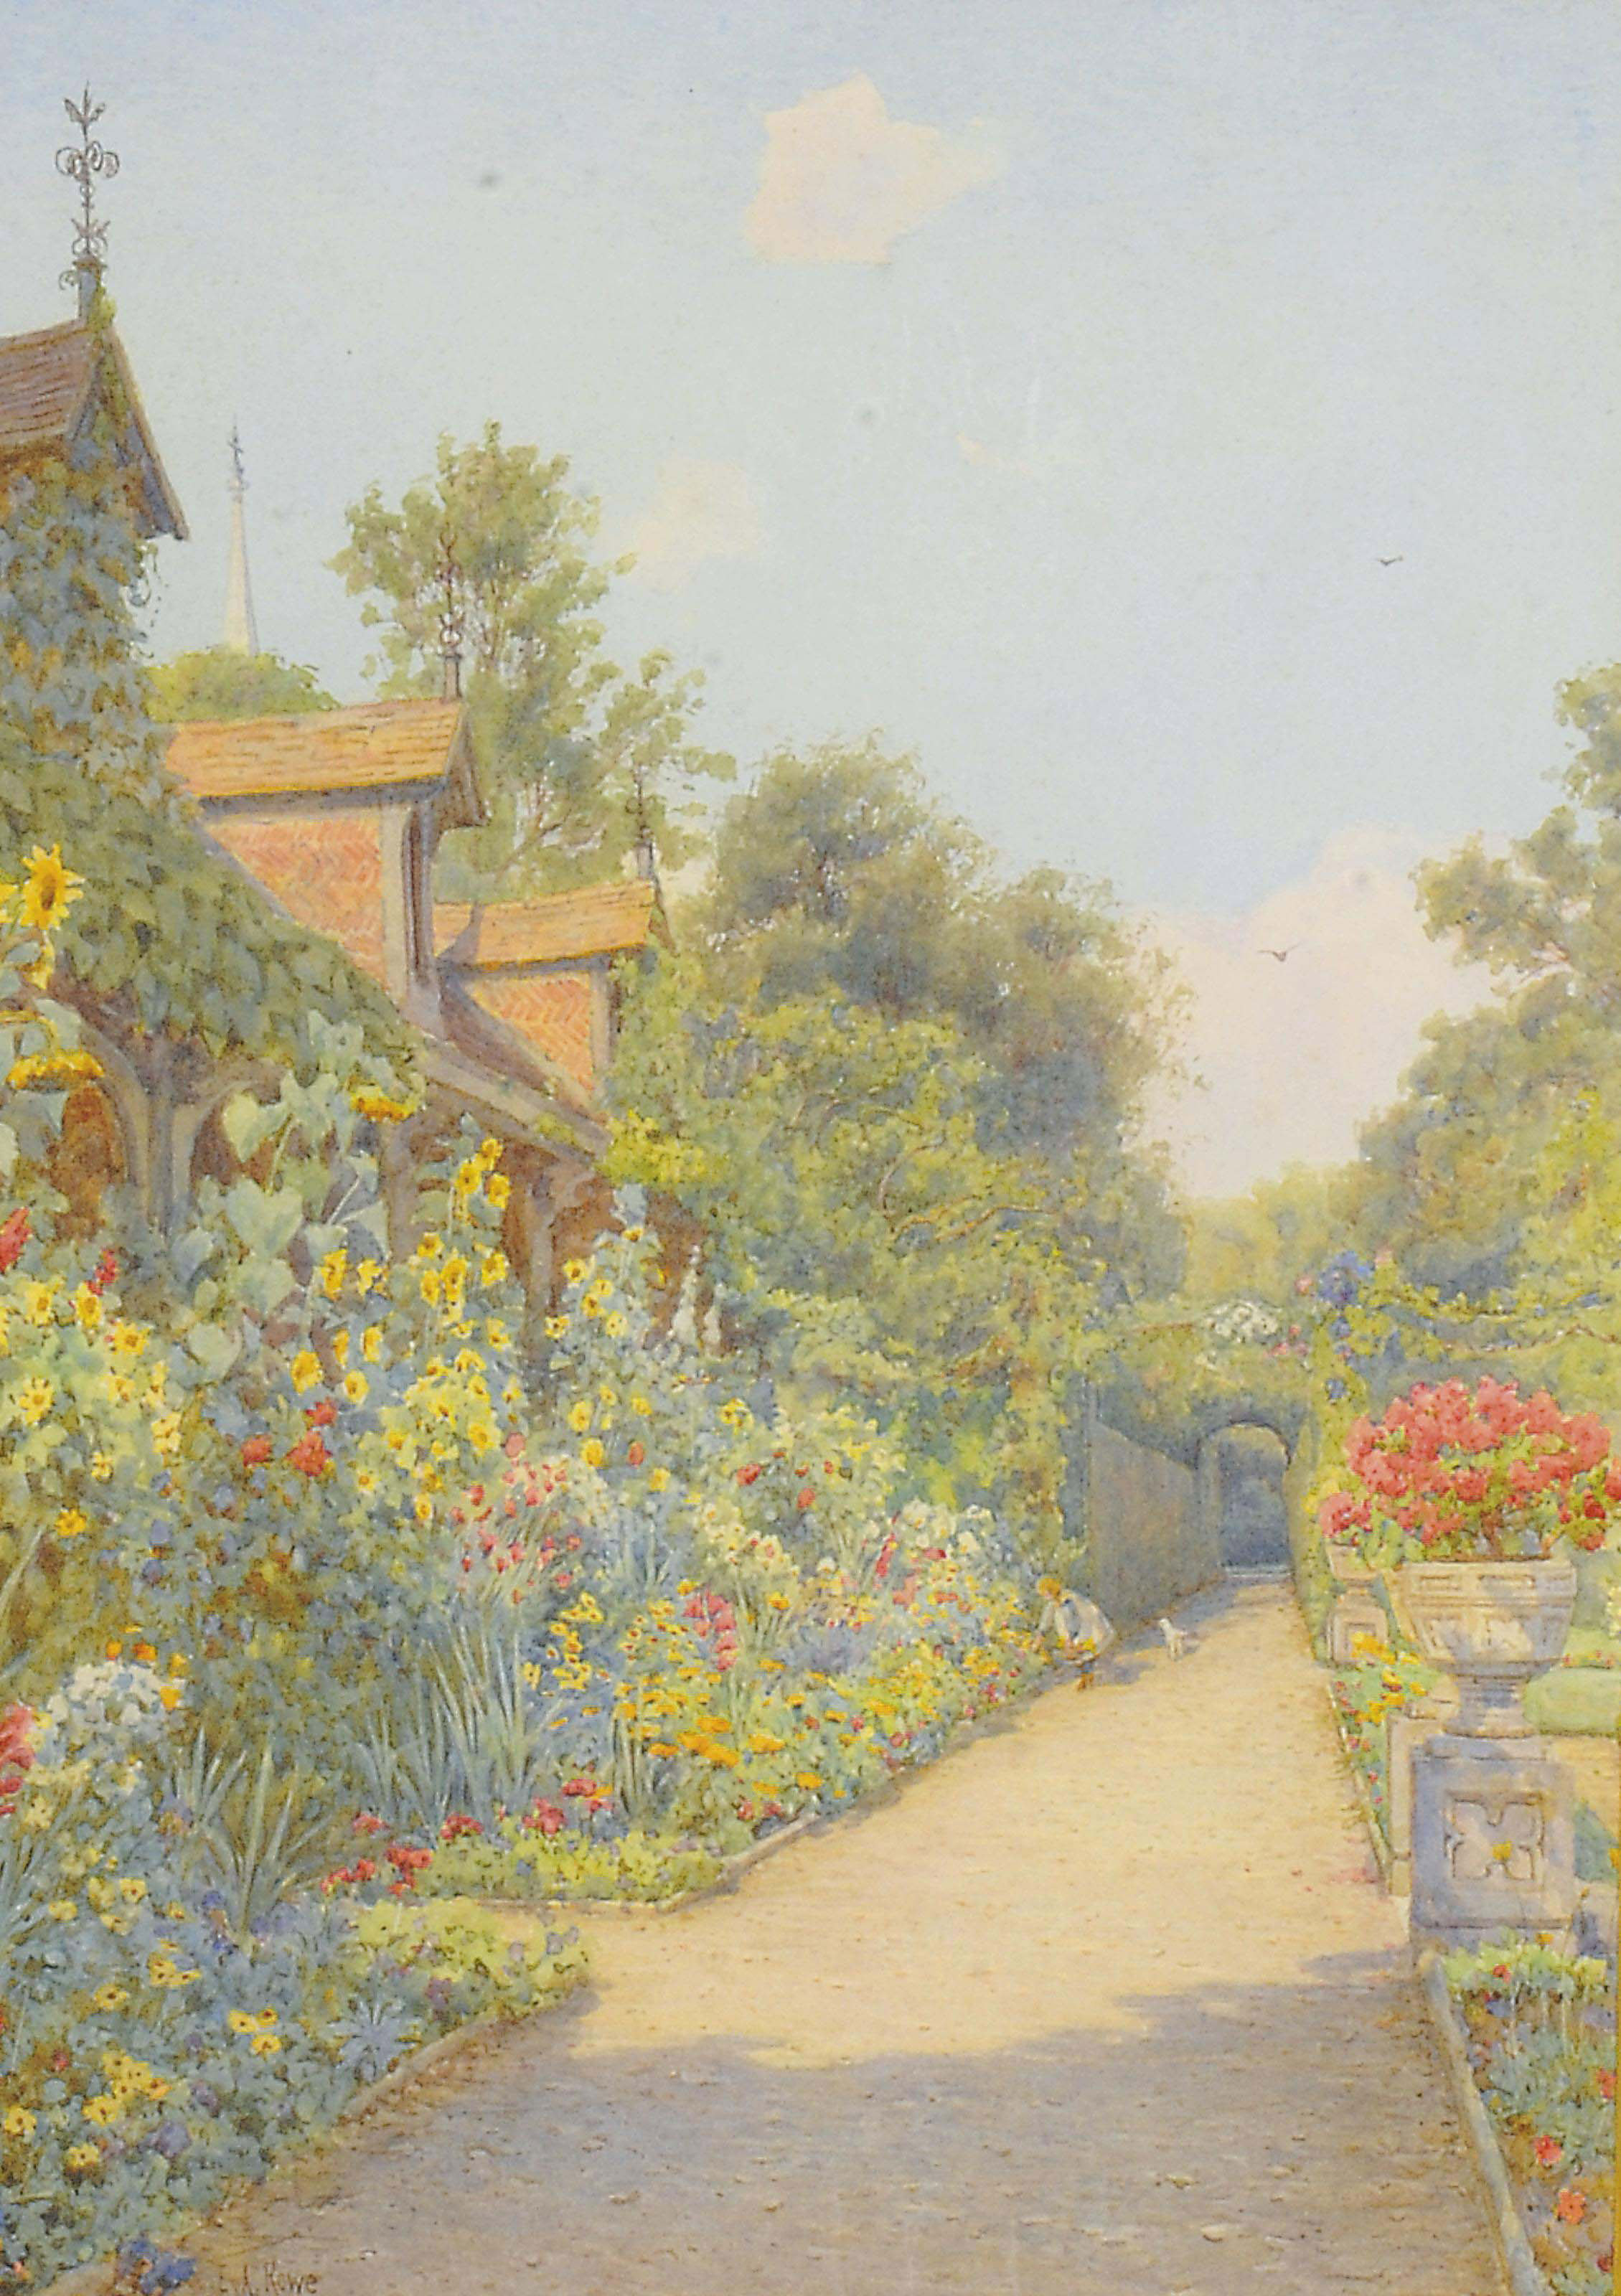 The Monk's Garden, Ashridge